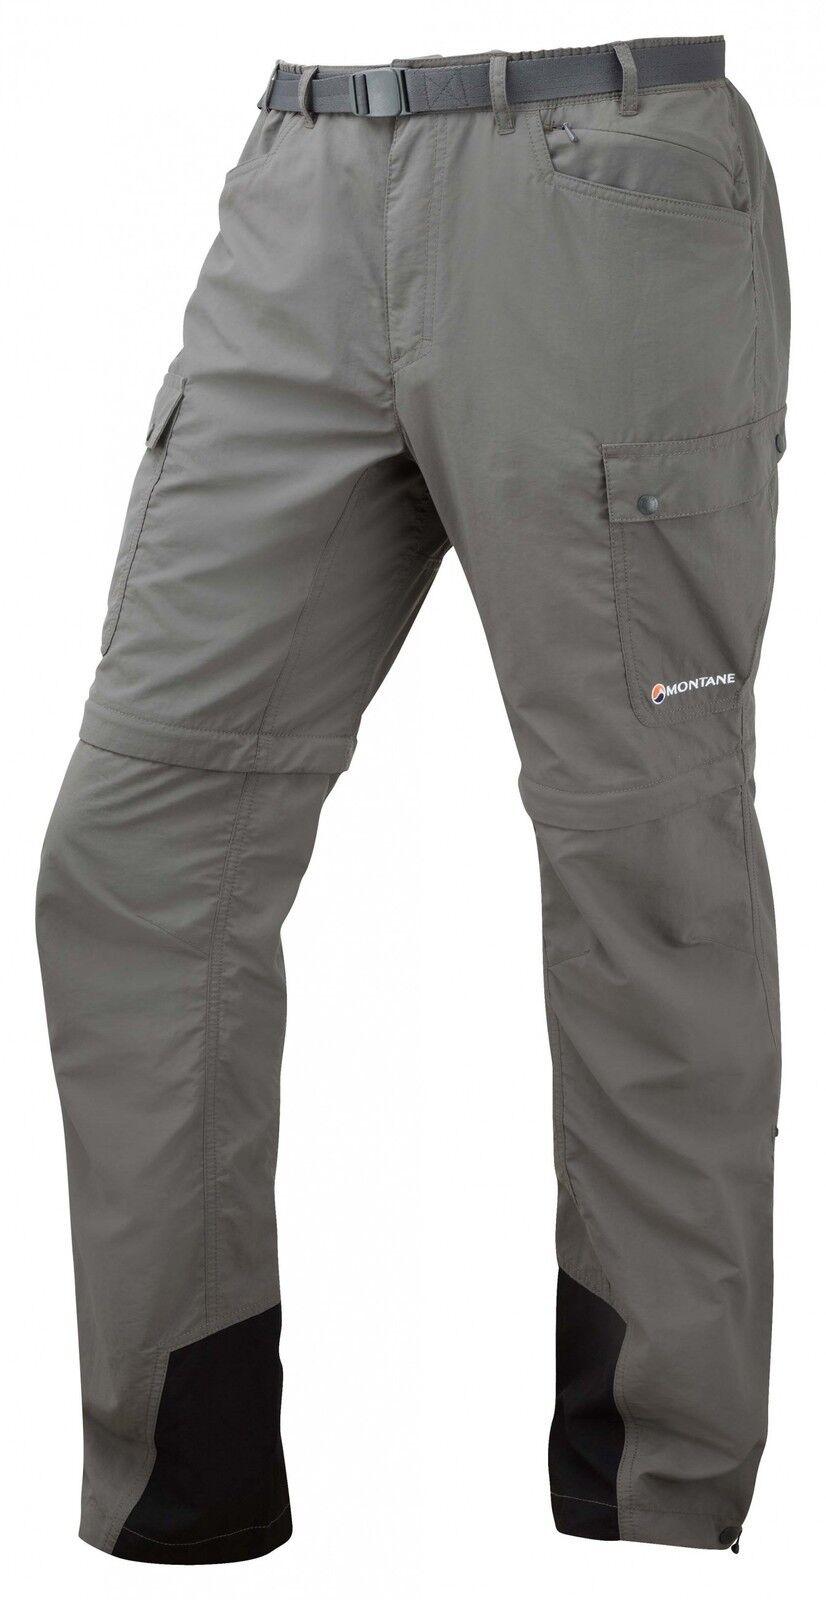 Montane Terra GT converdes ZIP-off pant, ZIP off  señores pantalones, Graphite  oferta de tienda